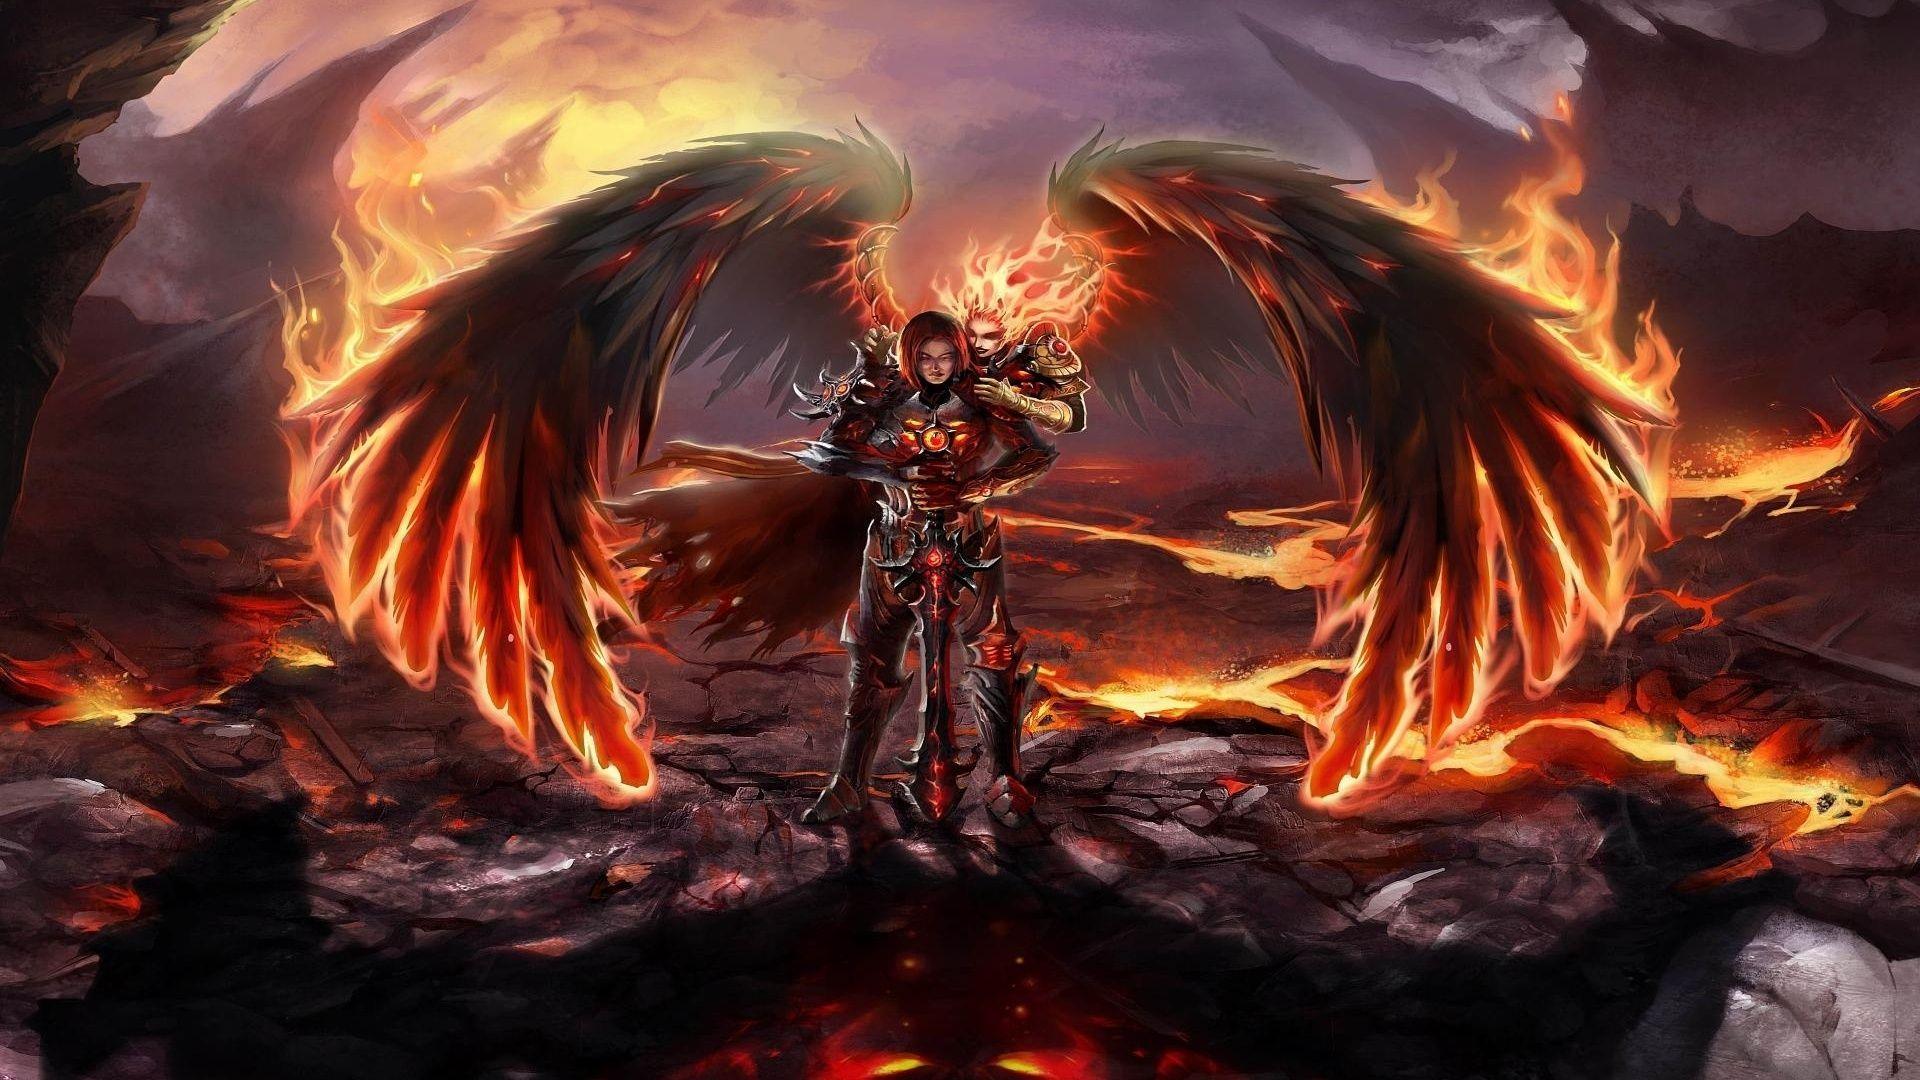 https://avante.biz/wp-content/uploads/Archangel-Wallpapers/Archangel-Wallpapers-048.jpg